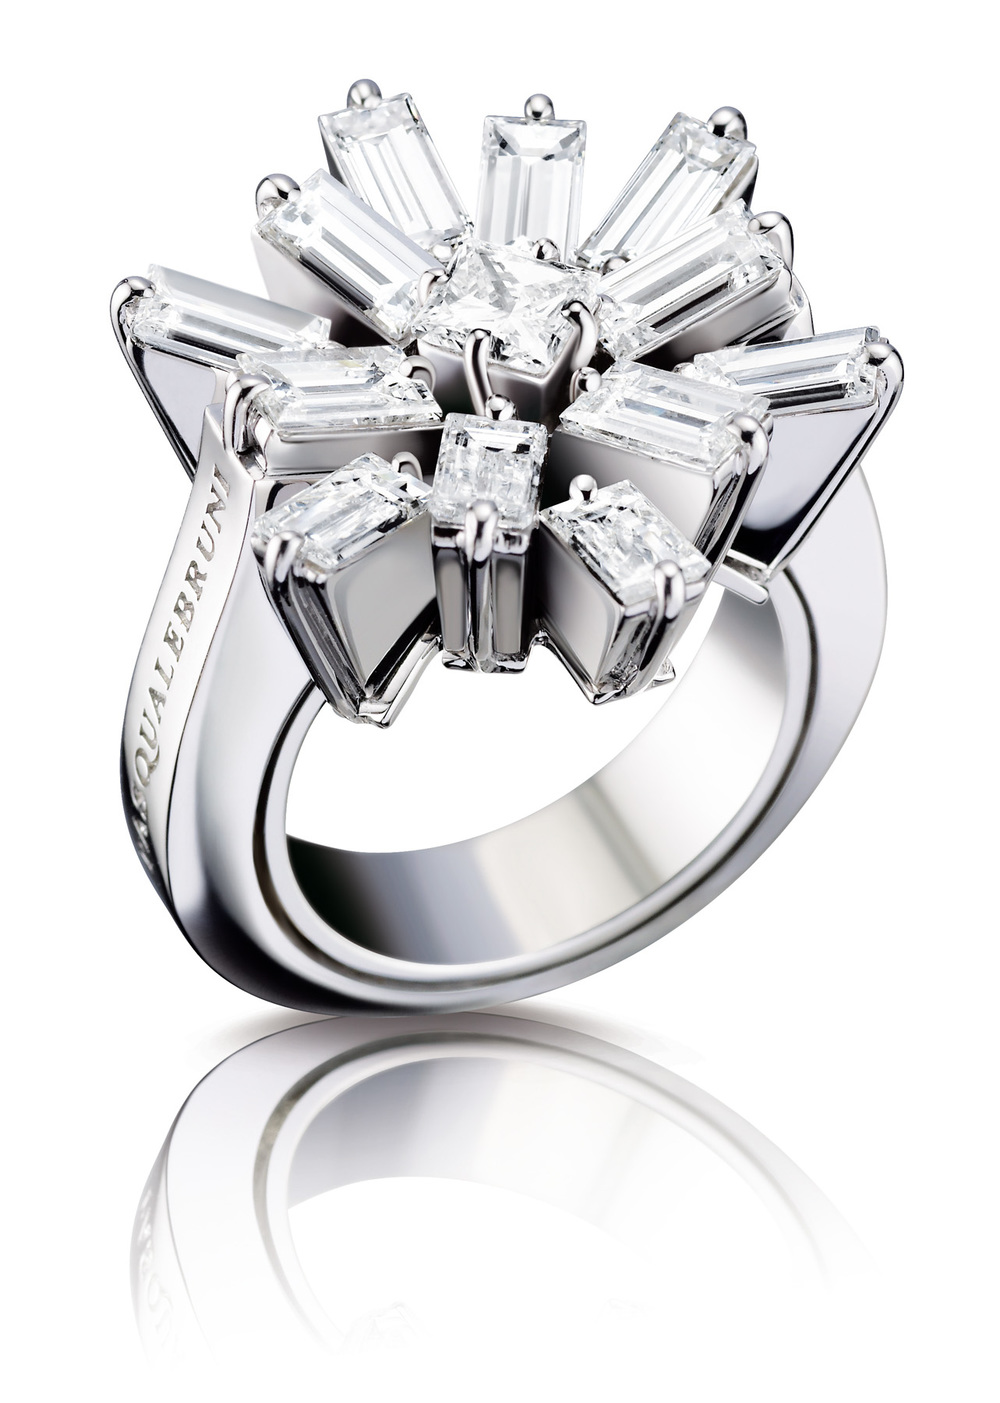 Atelier-ring-diamonds - Copy.jpg